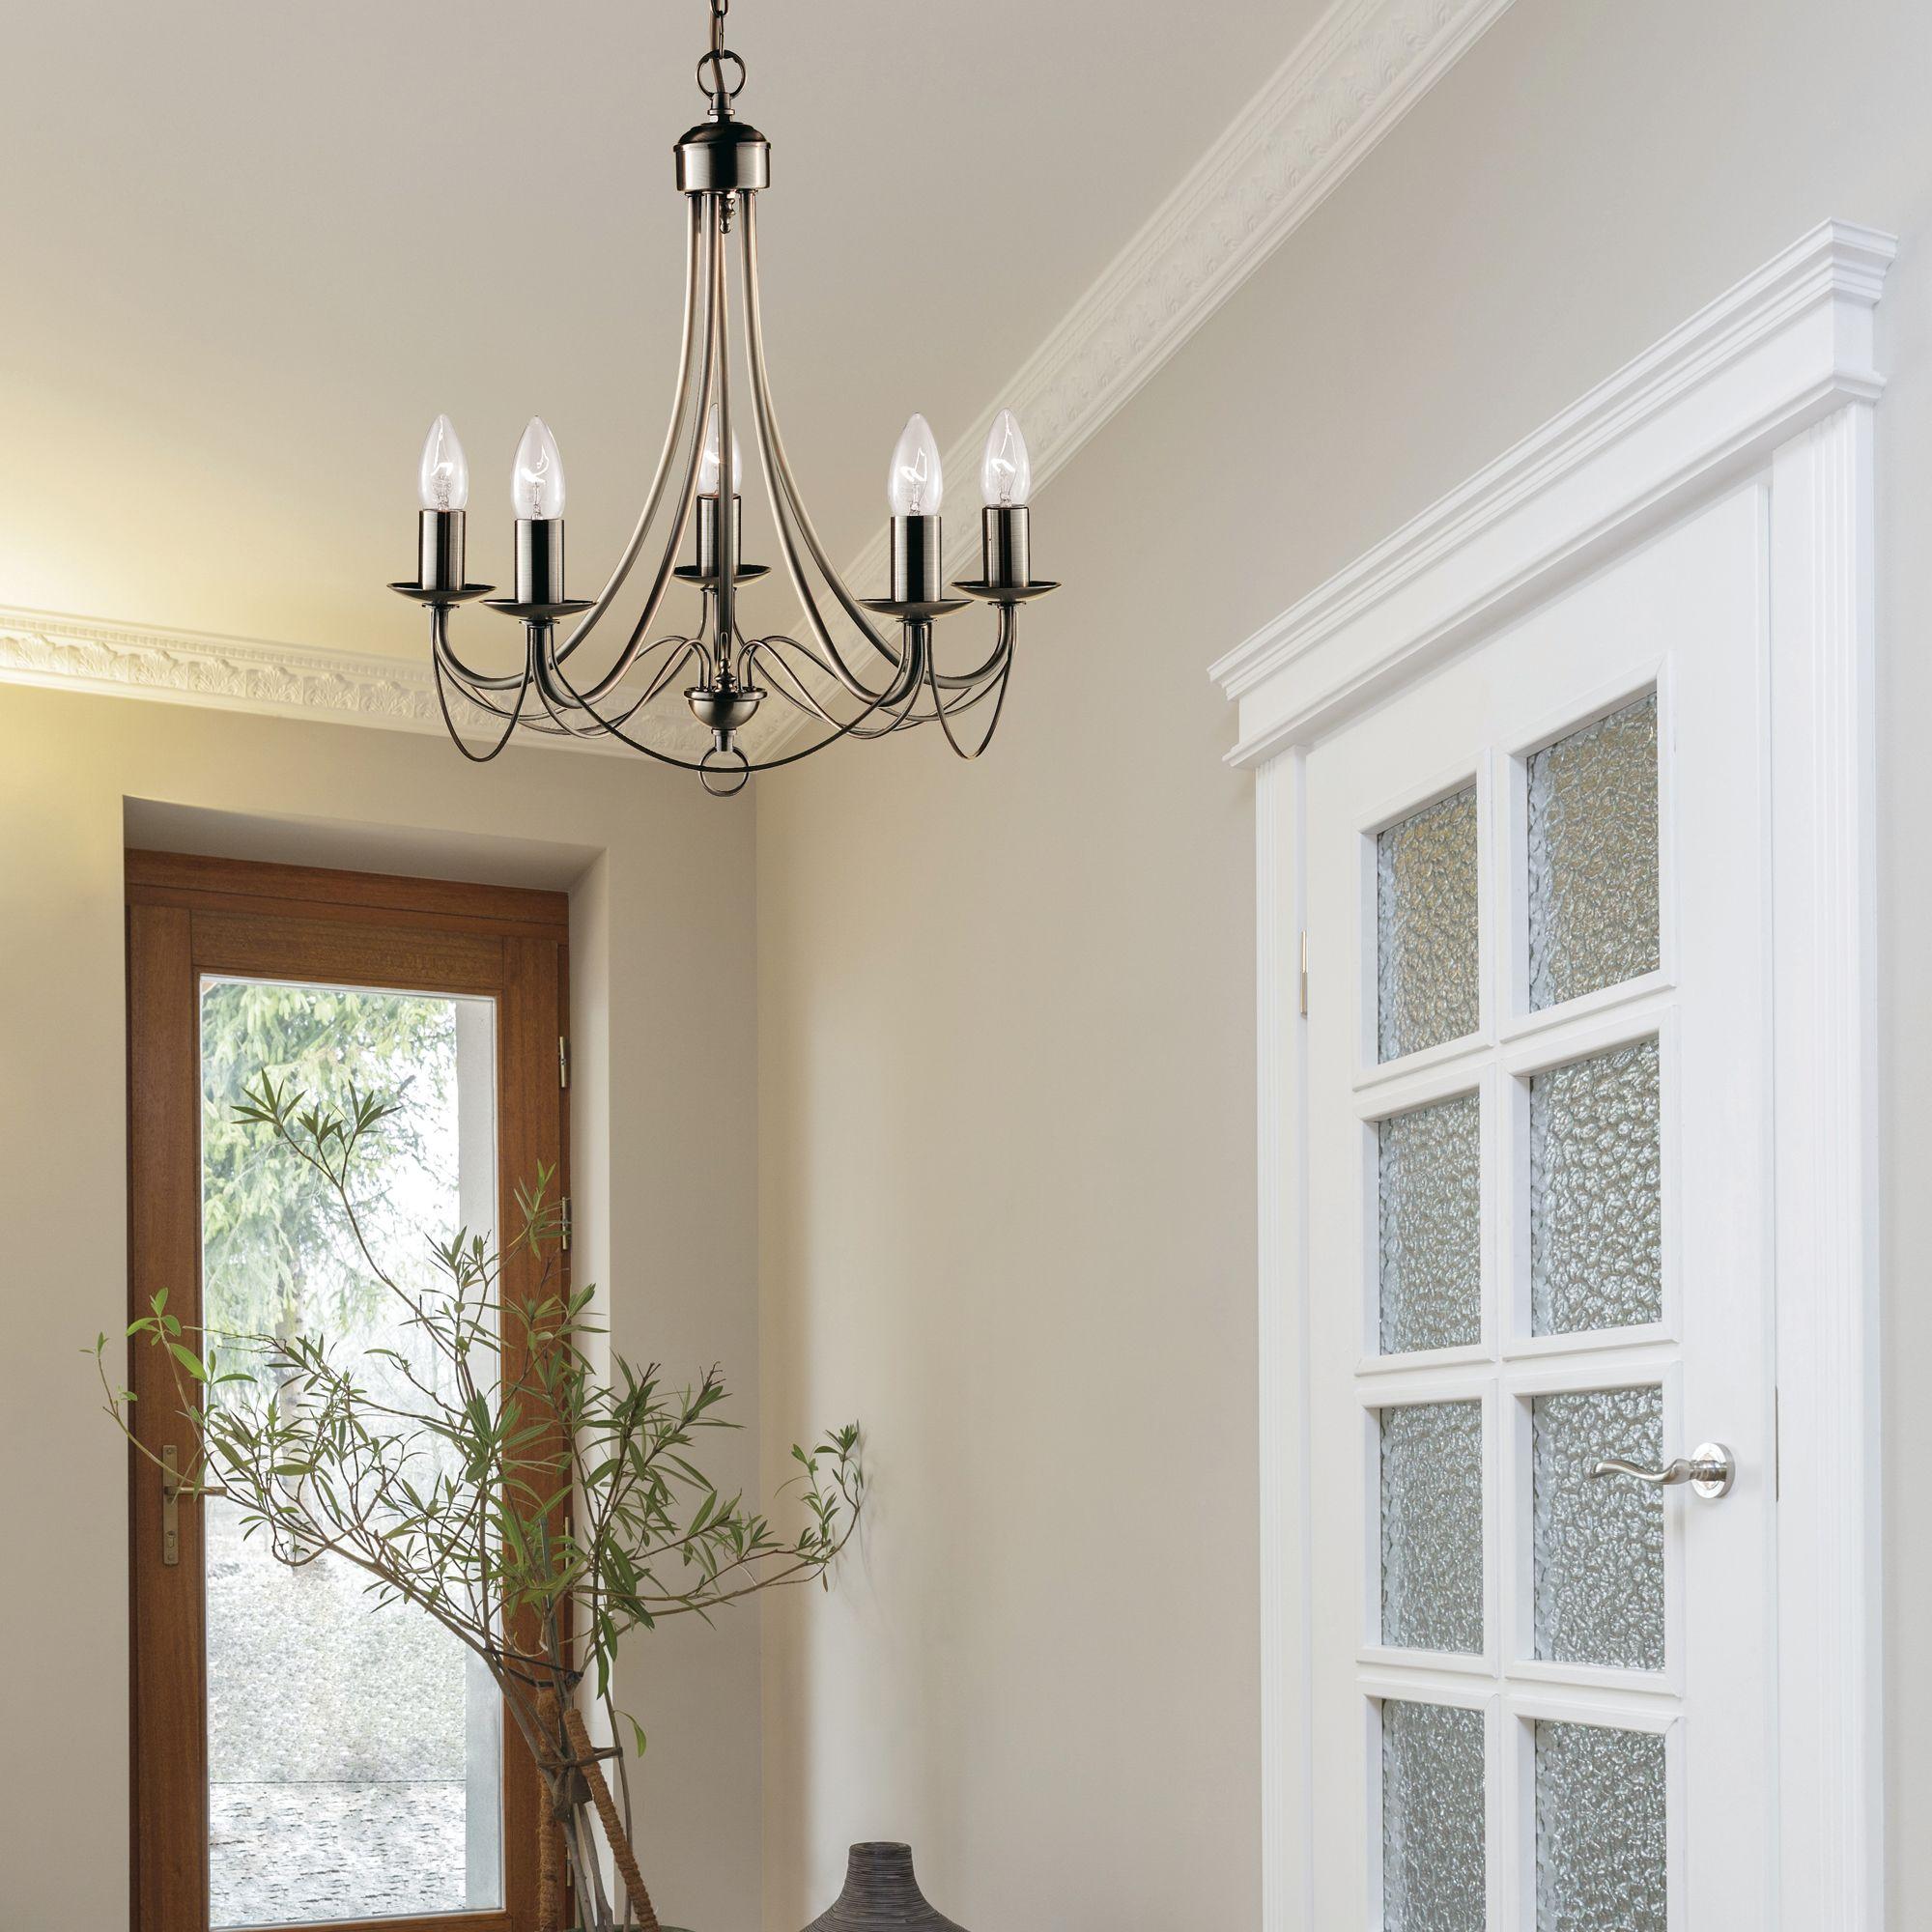 Swell Maypole Antique Brass 5 Light Multi Arm Fitting Birdcage Interior Design Ideas Tzicisoteloinfo